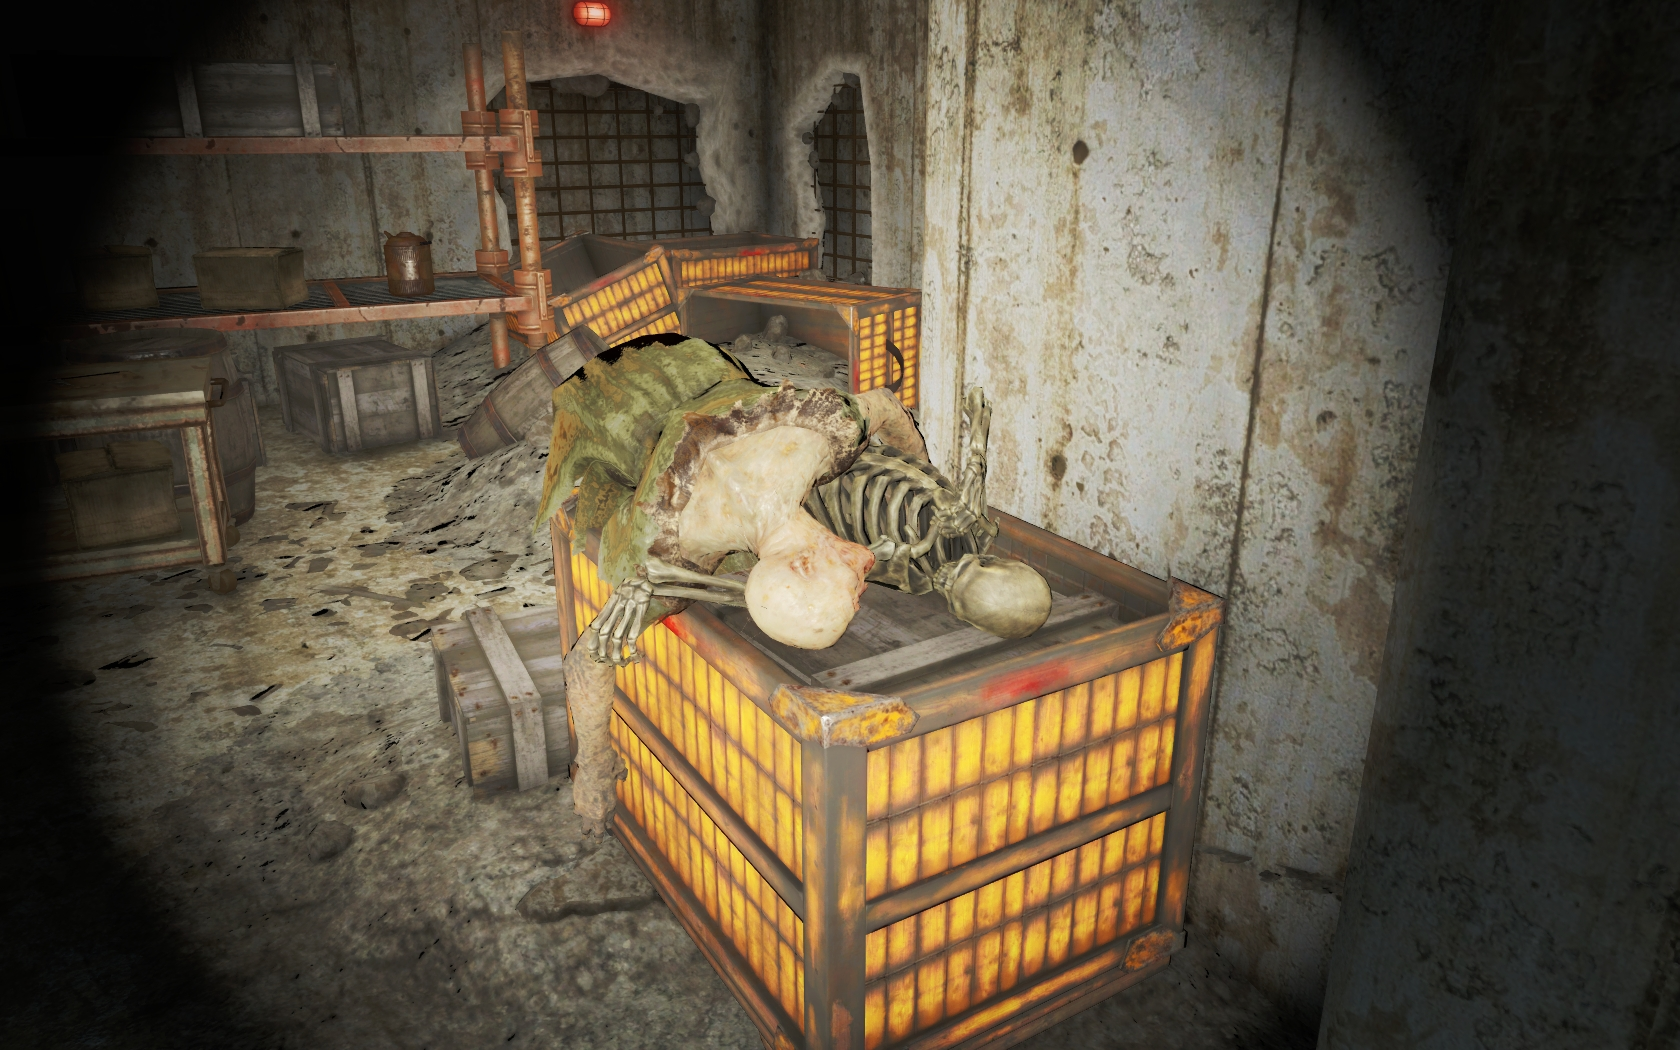 Борьба за выживание (Фар-Харбор, Дубильня Иглс-Коув) - Fallout 4 гуль, Дубильня, Дубильня Иглс-Коув, Иглс-Коув, скелет